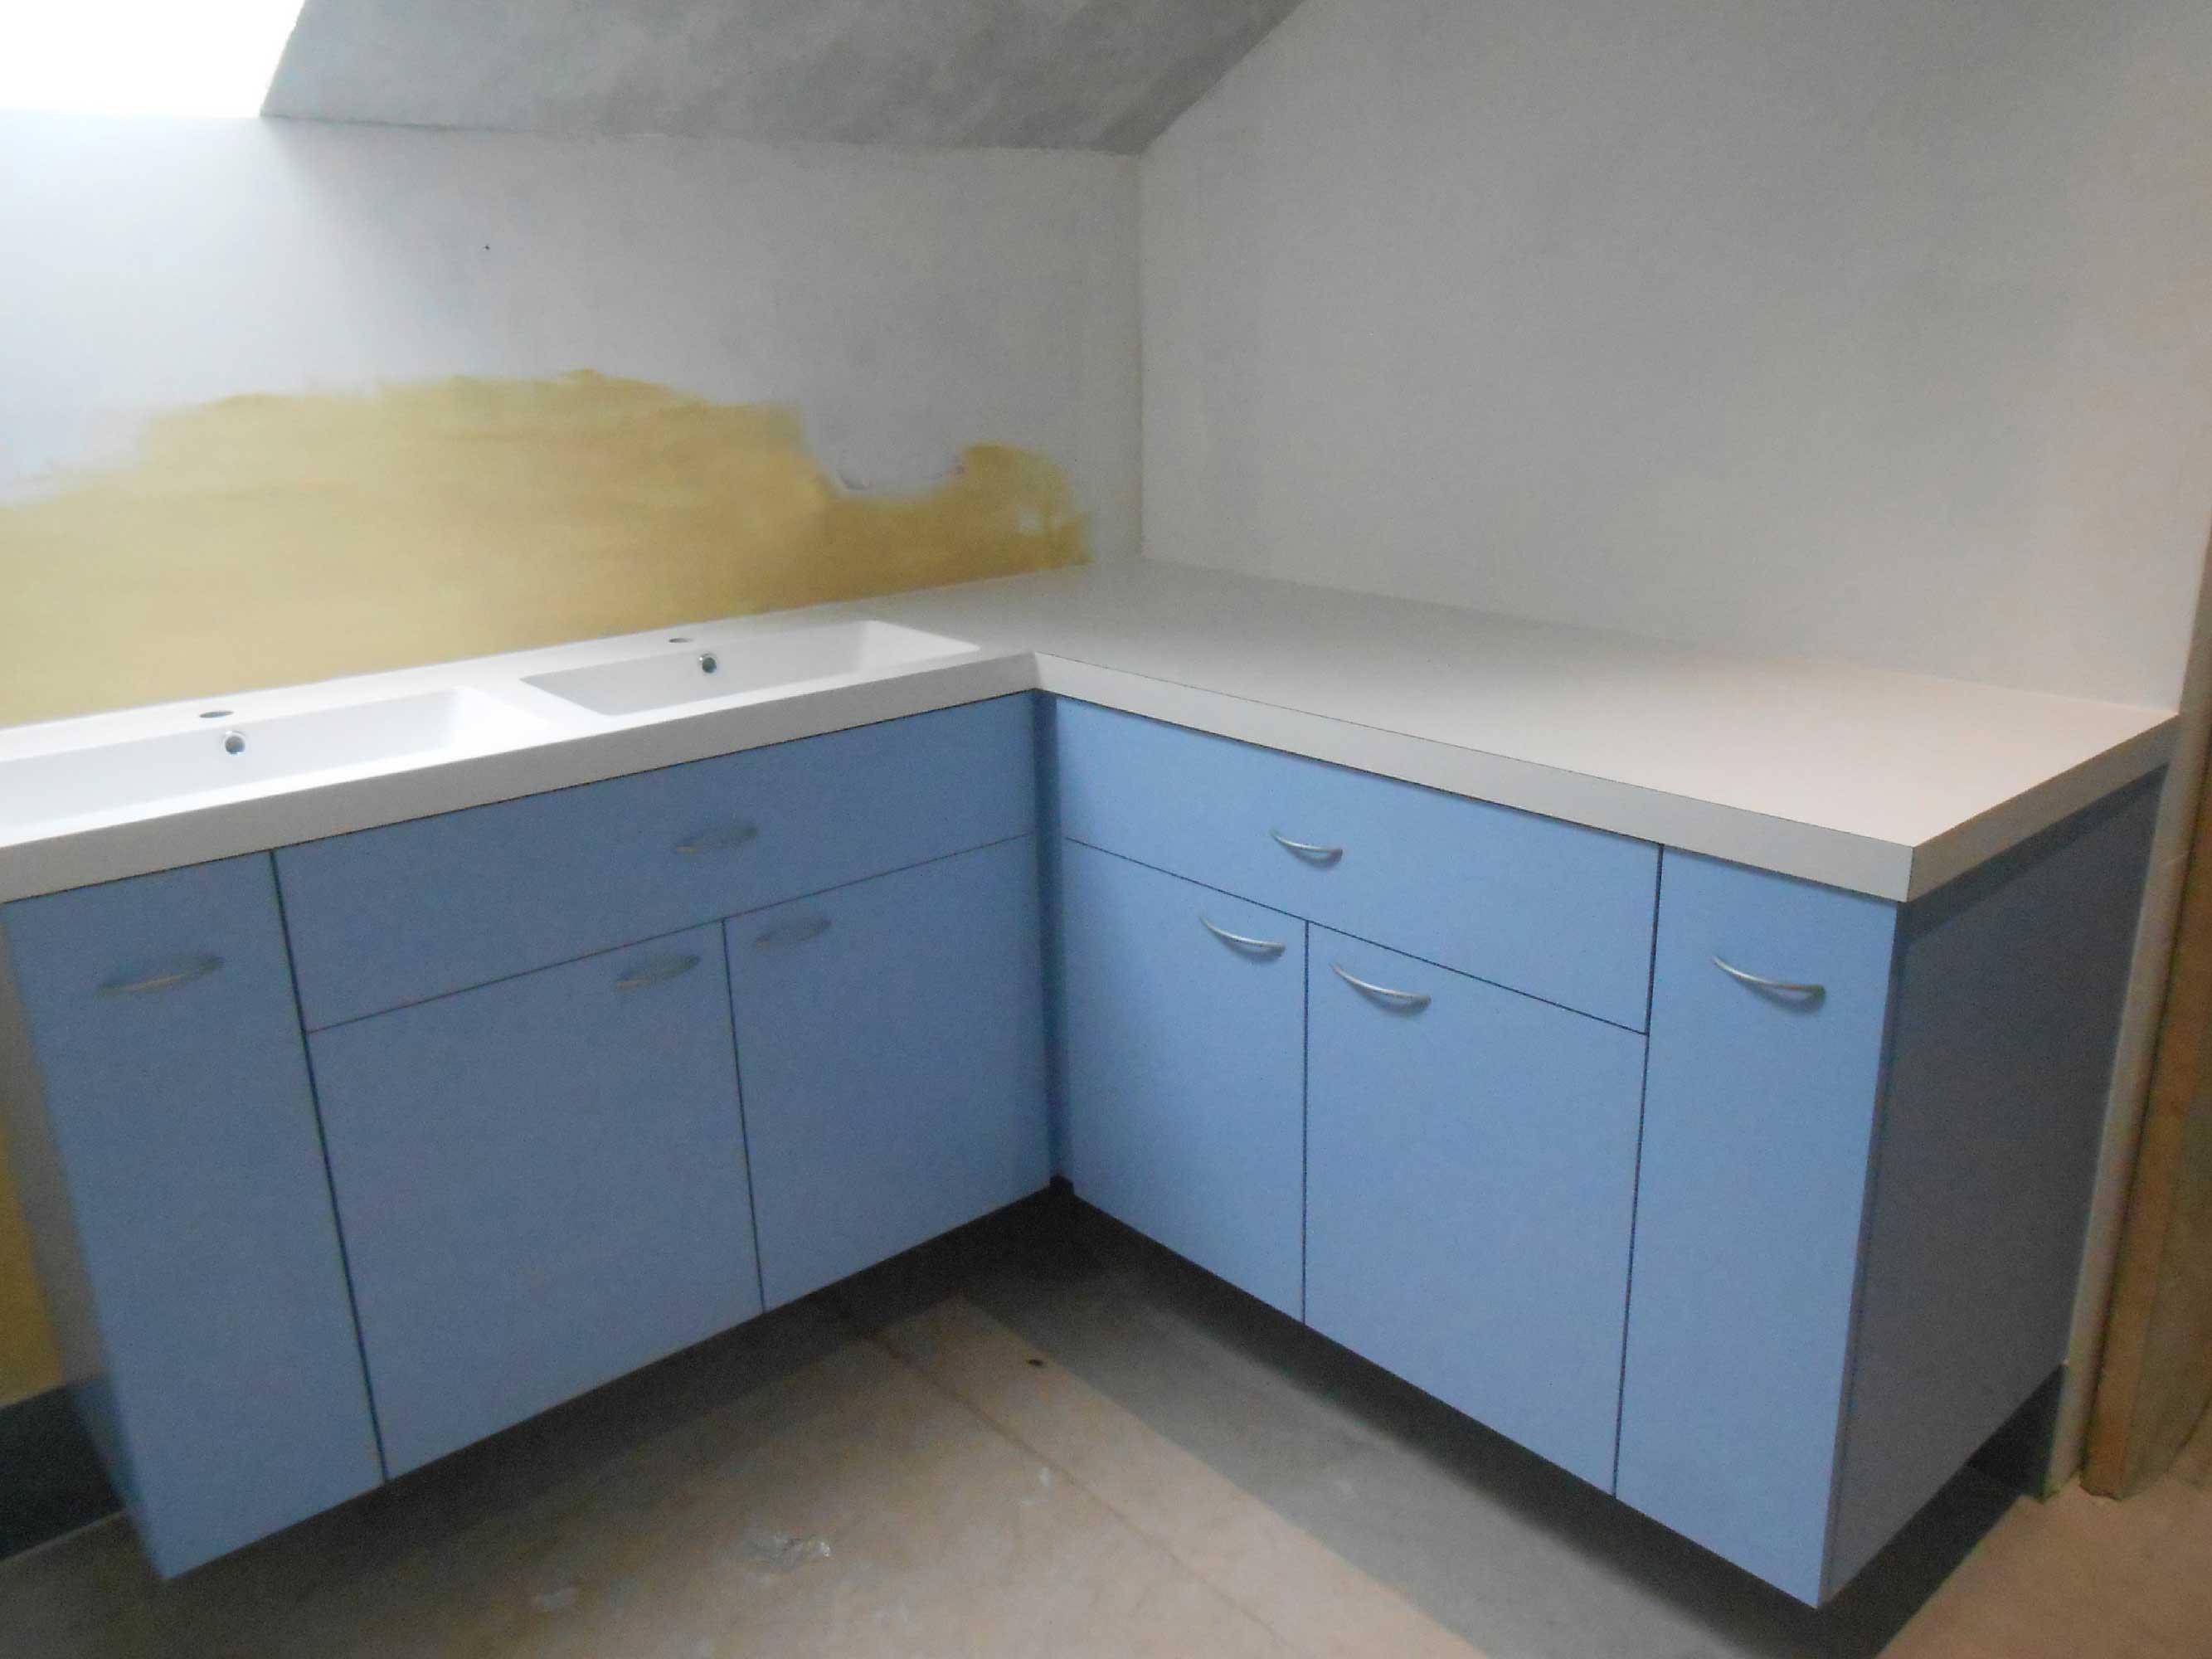 meubles objets en bois sur mesure menuiserie drifford. Black Bedroom Furniture Sets. Home Design Ideas